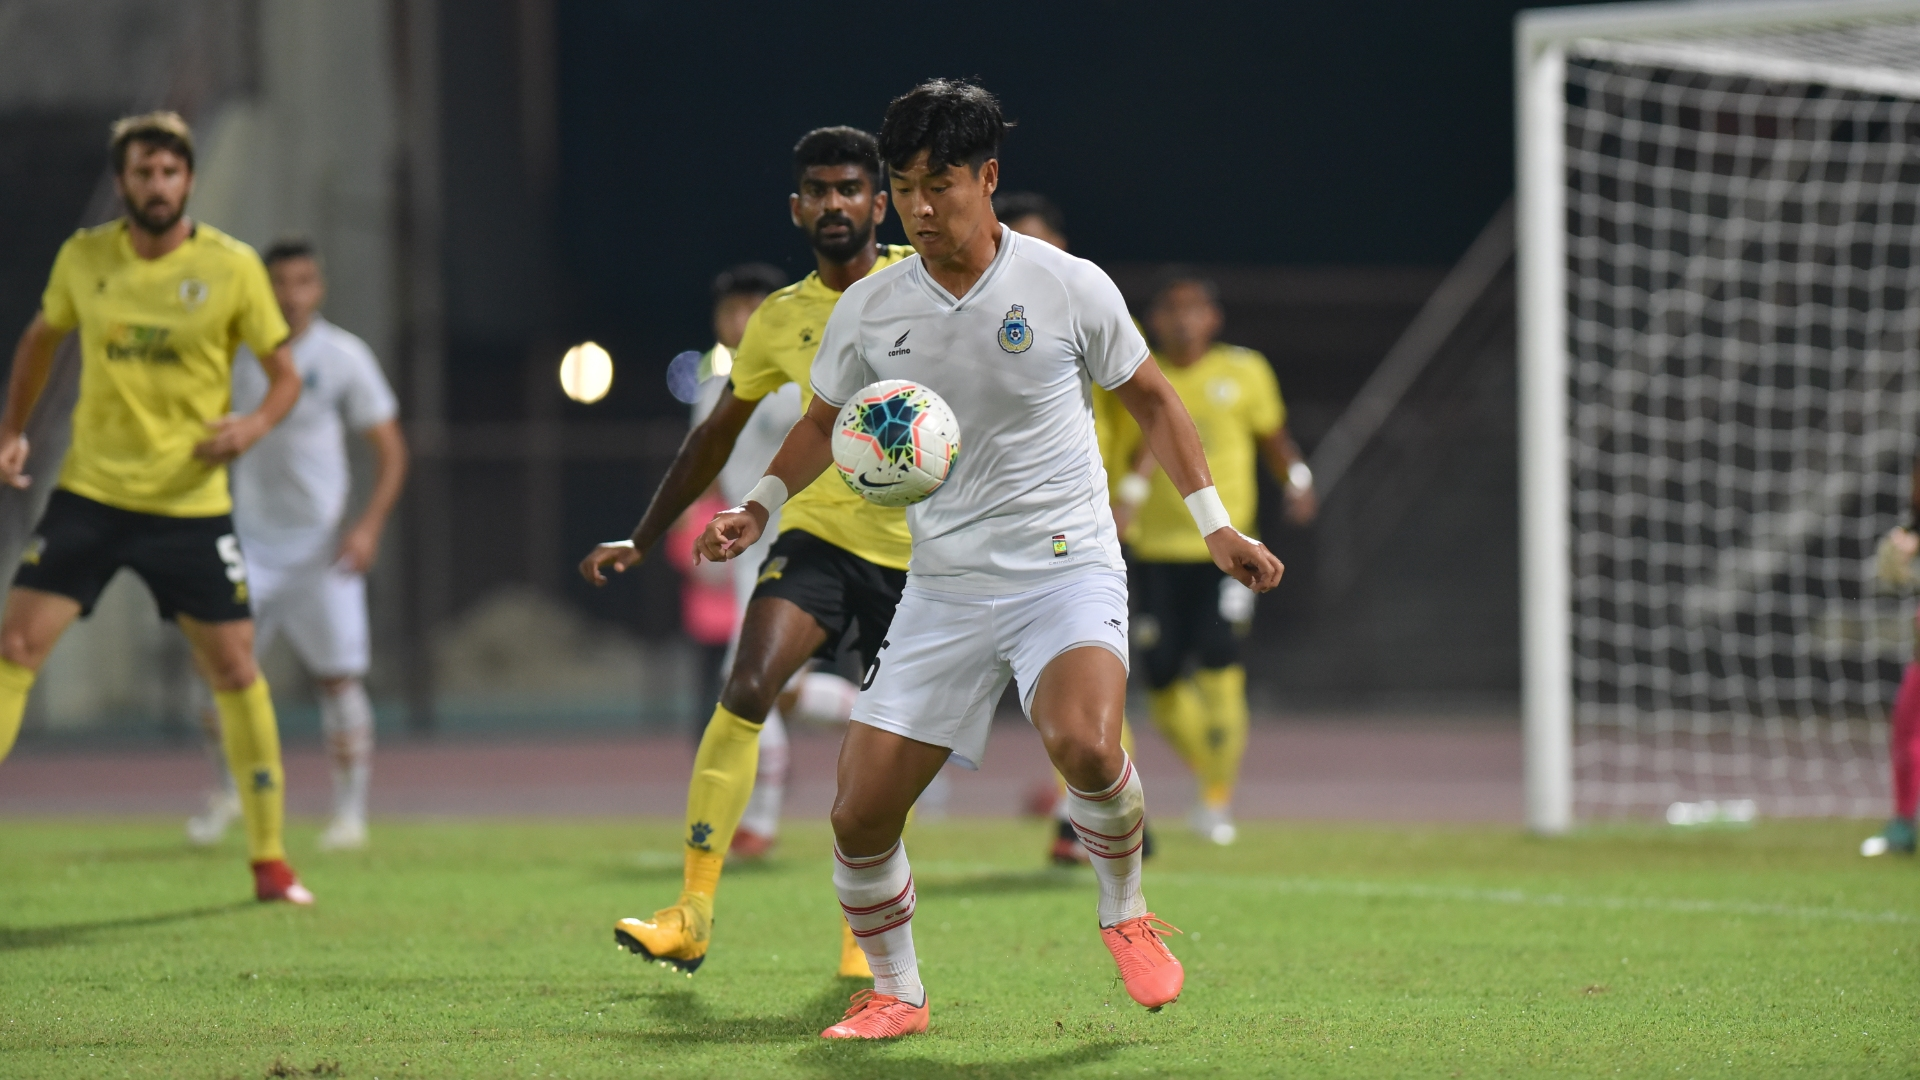 Park Tae-su, Kenny Pallraj, Sabah v Perak, Super League, 14 Mar 2020